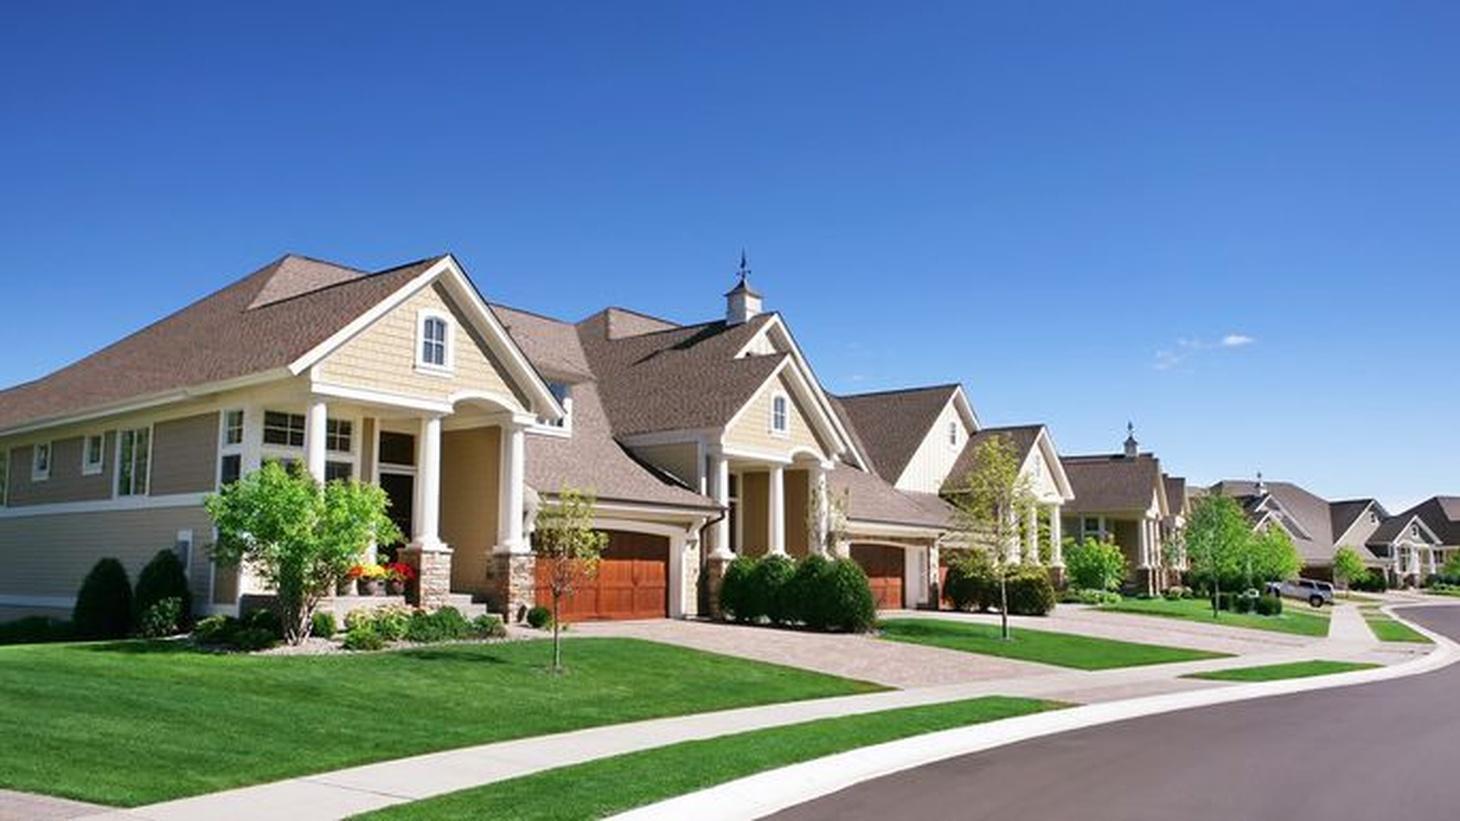 Single family homes.